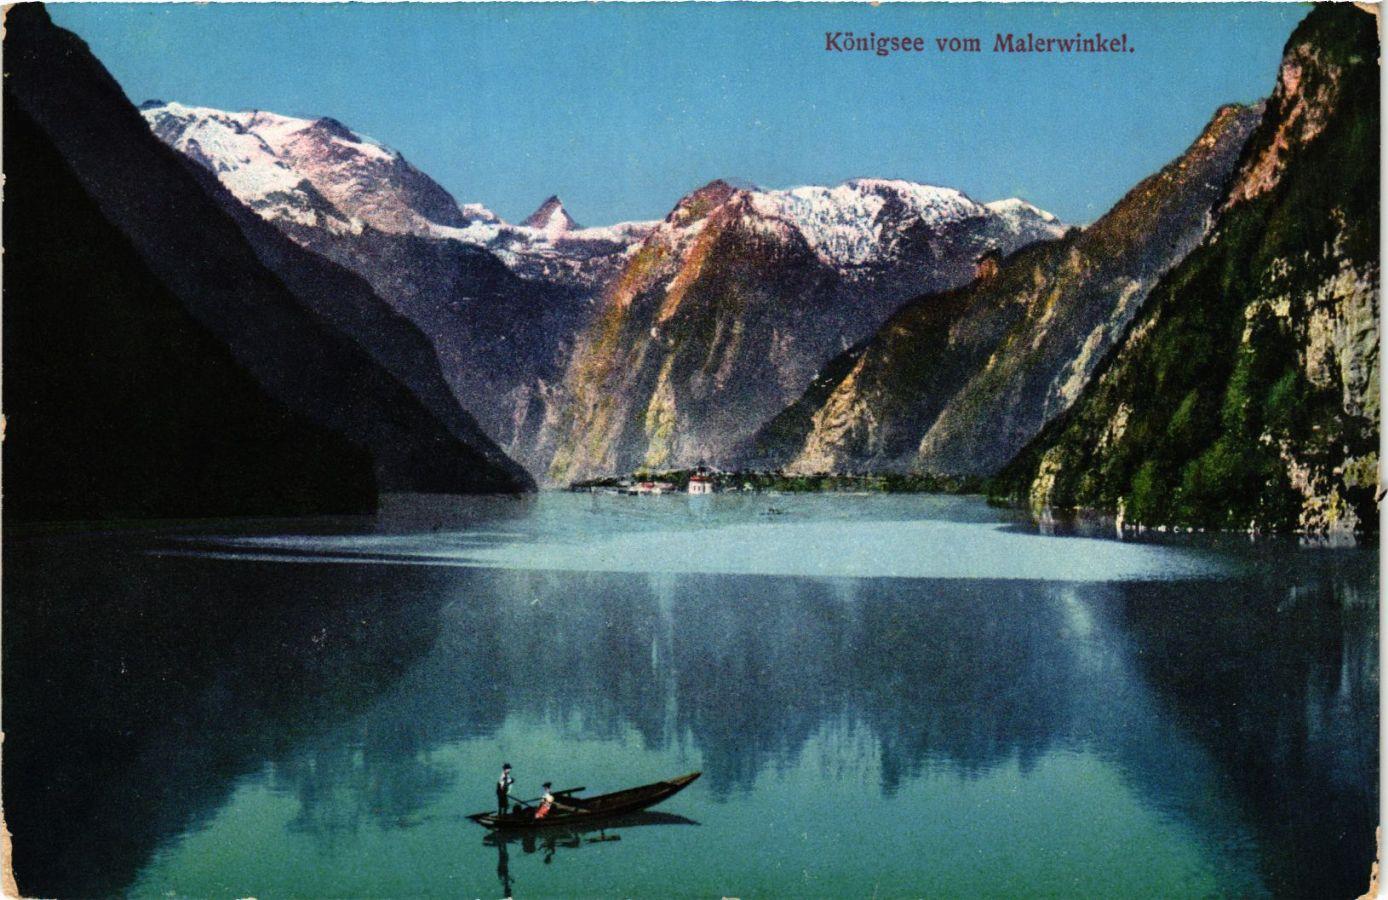 CPA-AK-Konigssee-vom-Malerwinkel-GERMANY-878800